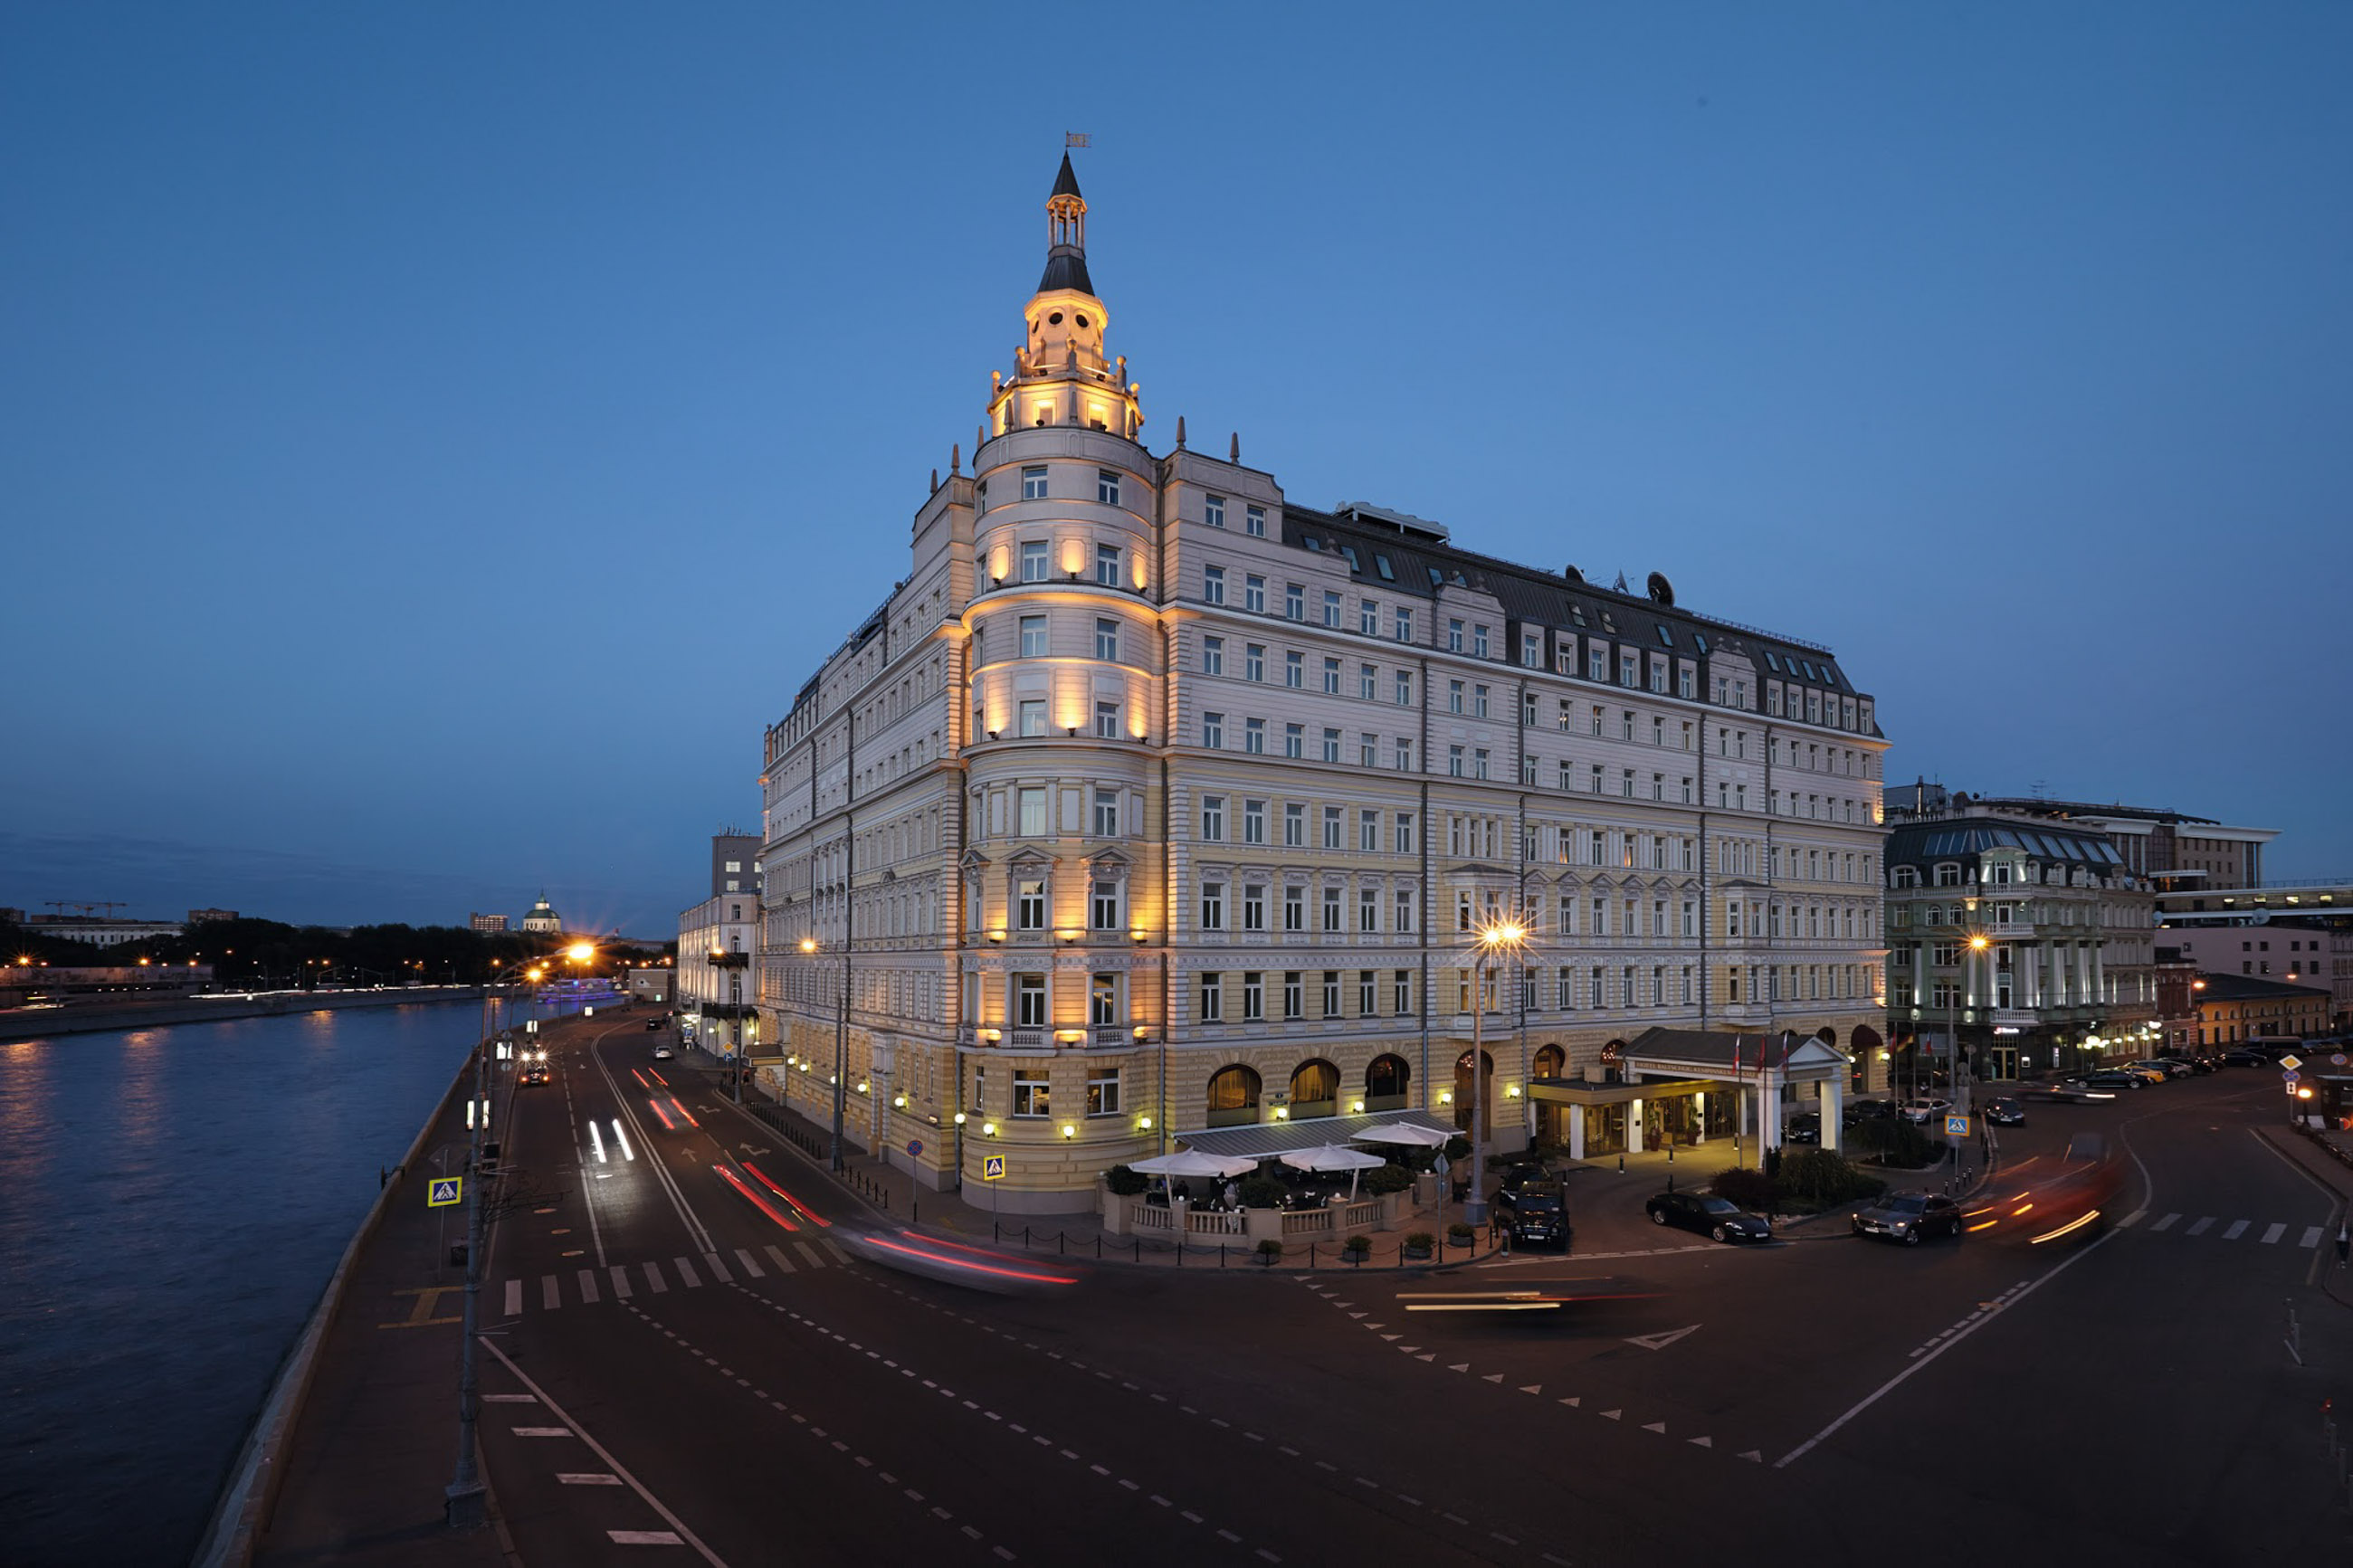 https://bubo.sk/uploads/galleries/5056/kempinski_moskva_rusko_hotel-baltschug-kempinski-moscow_12604_print.jpg